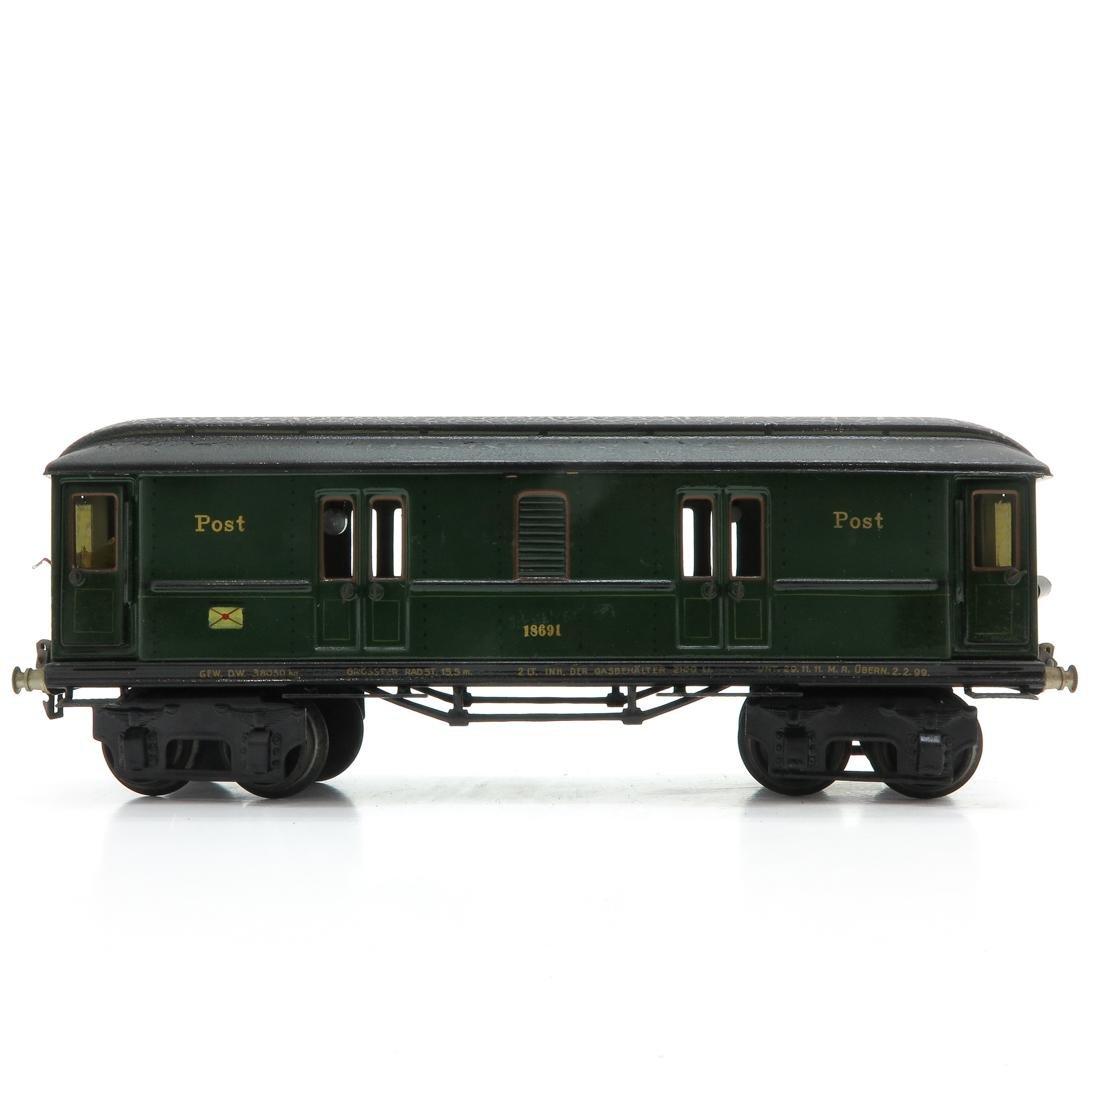 Vintage Marklin Post Wagon